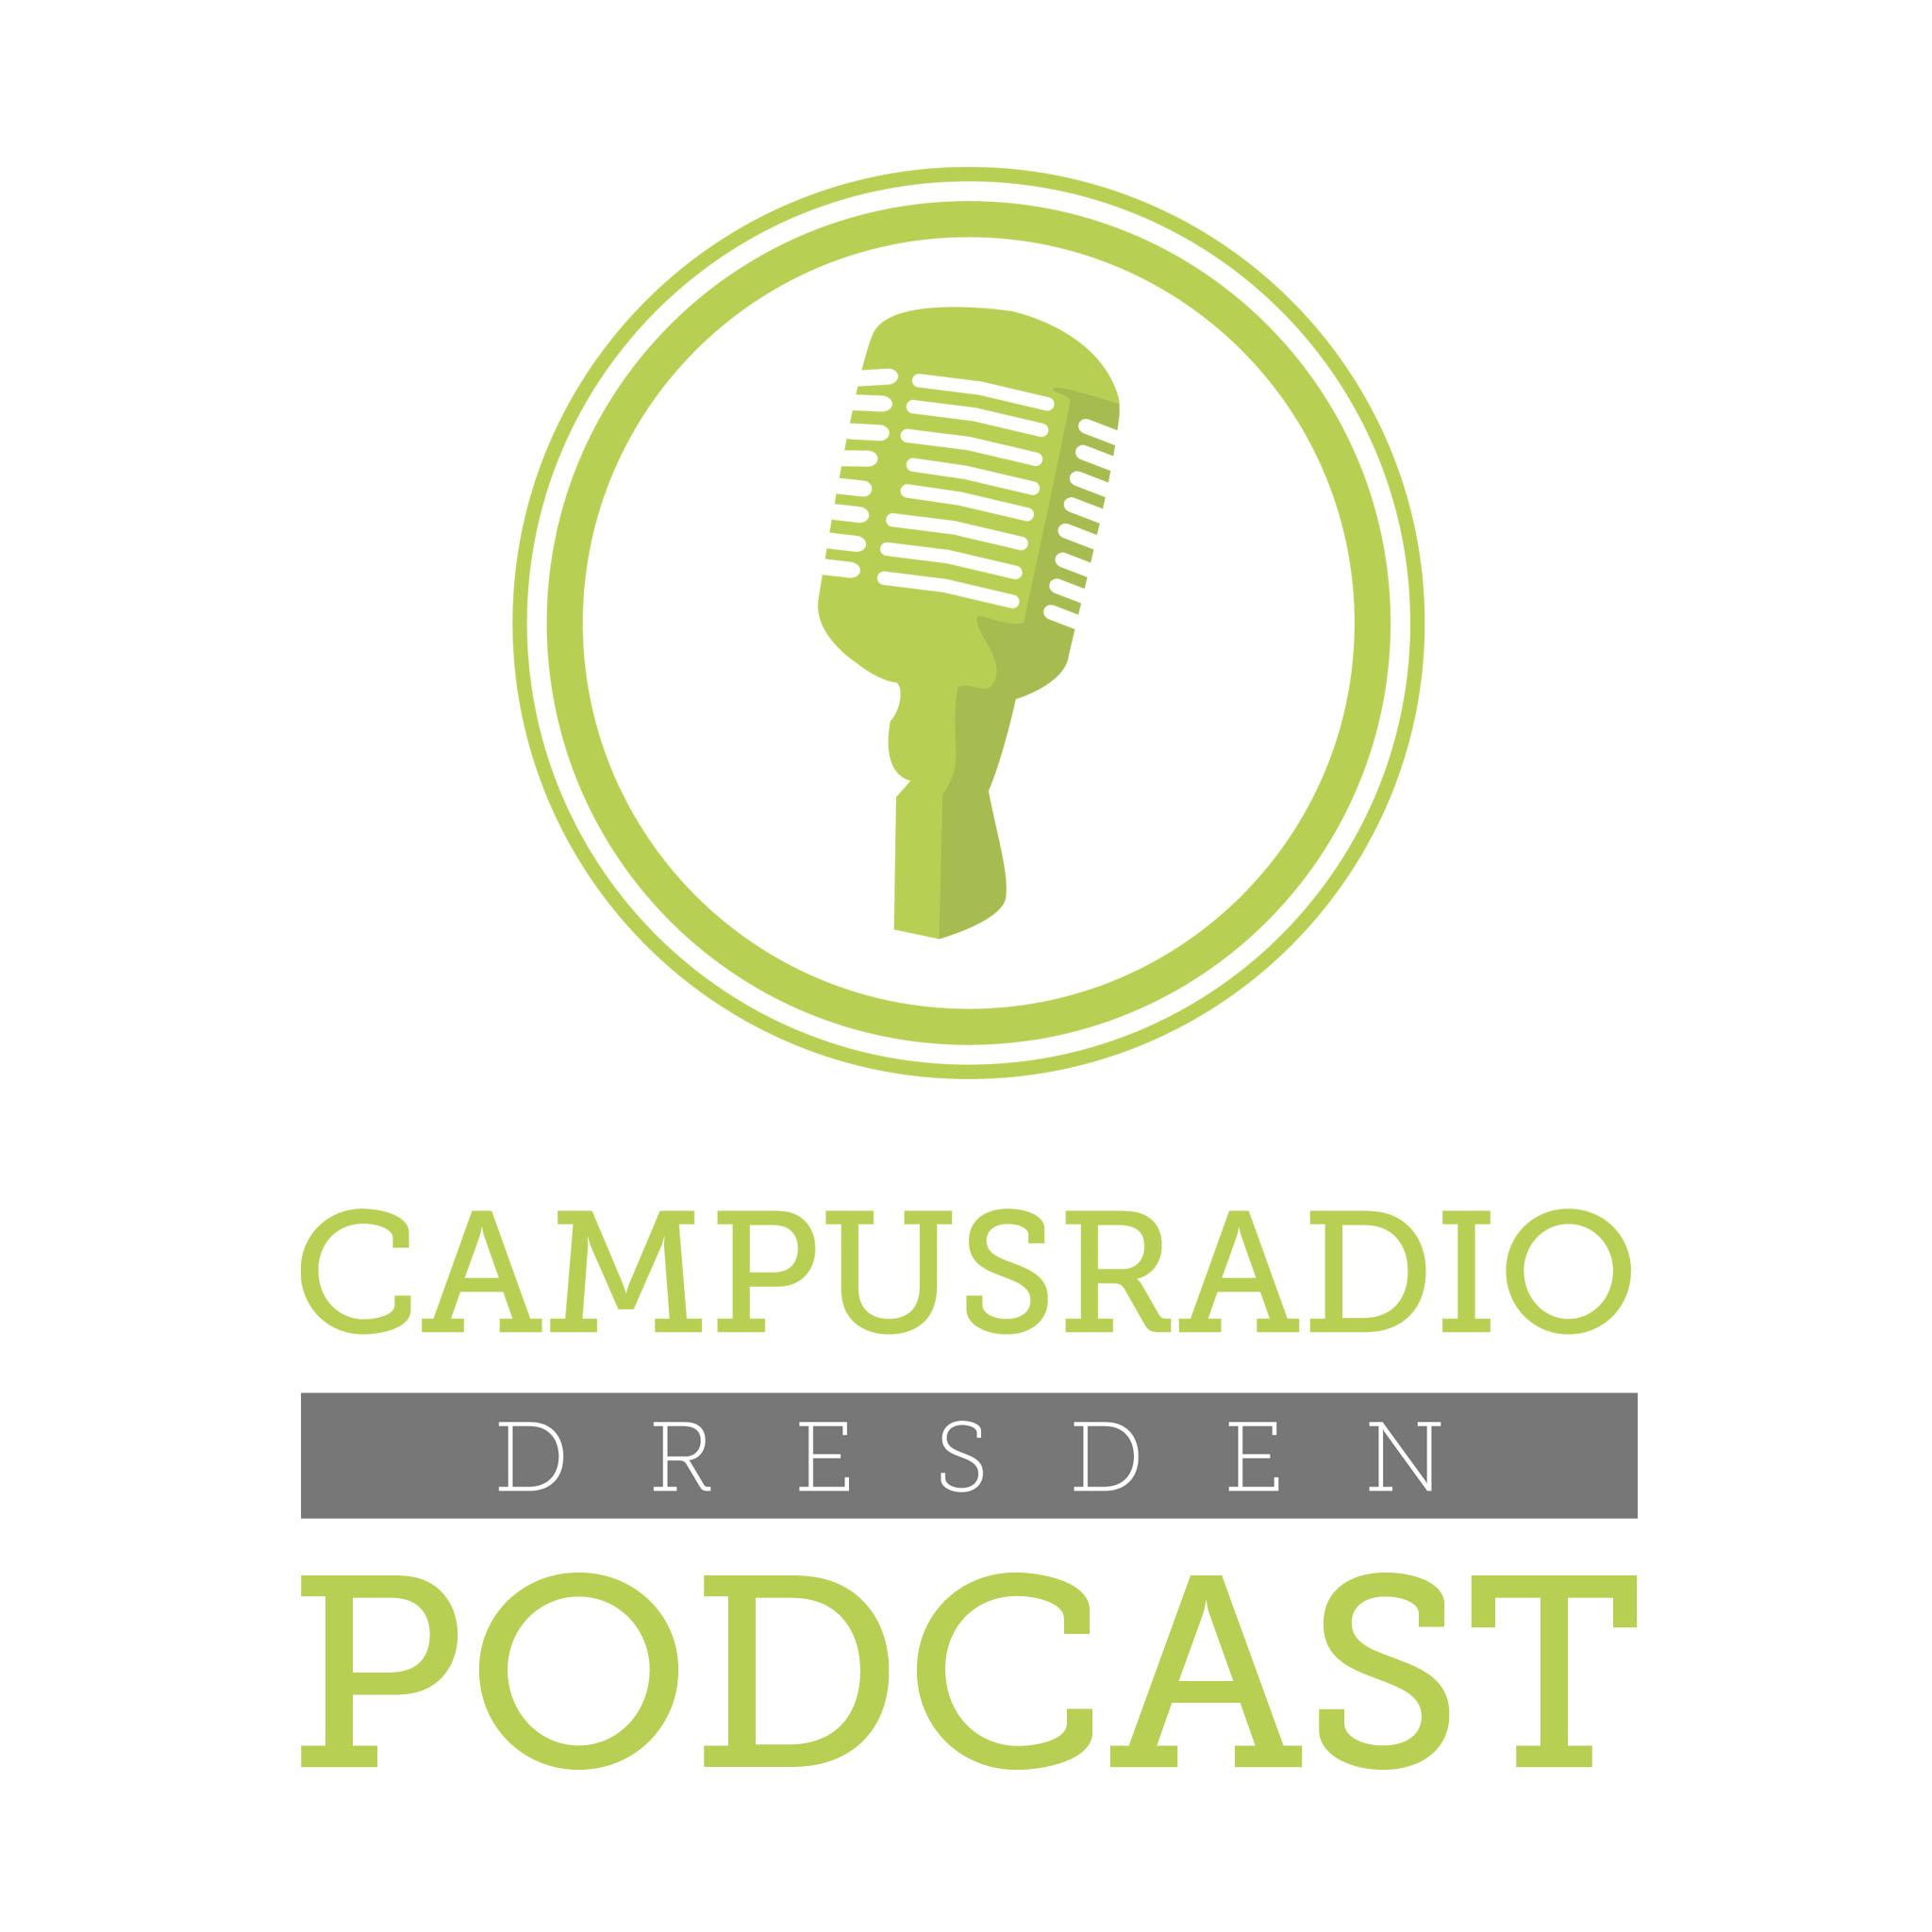 widu14 die b hne campusradio dresden podcast. Black Bedroom Furniture Sets. Home Design Ideas